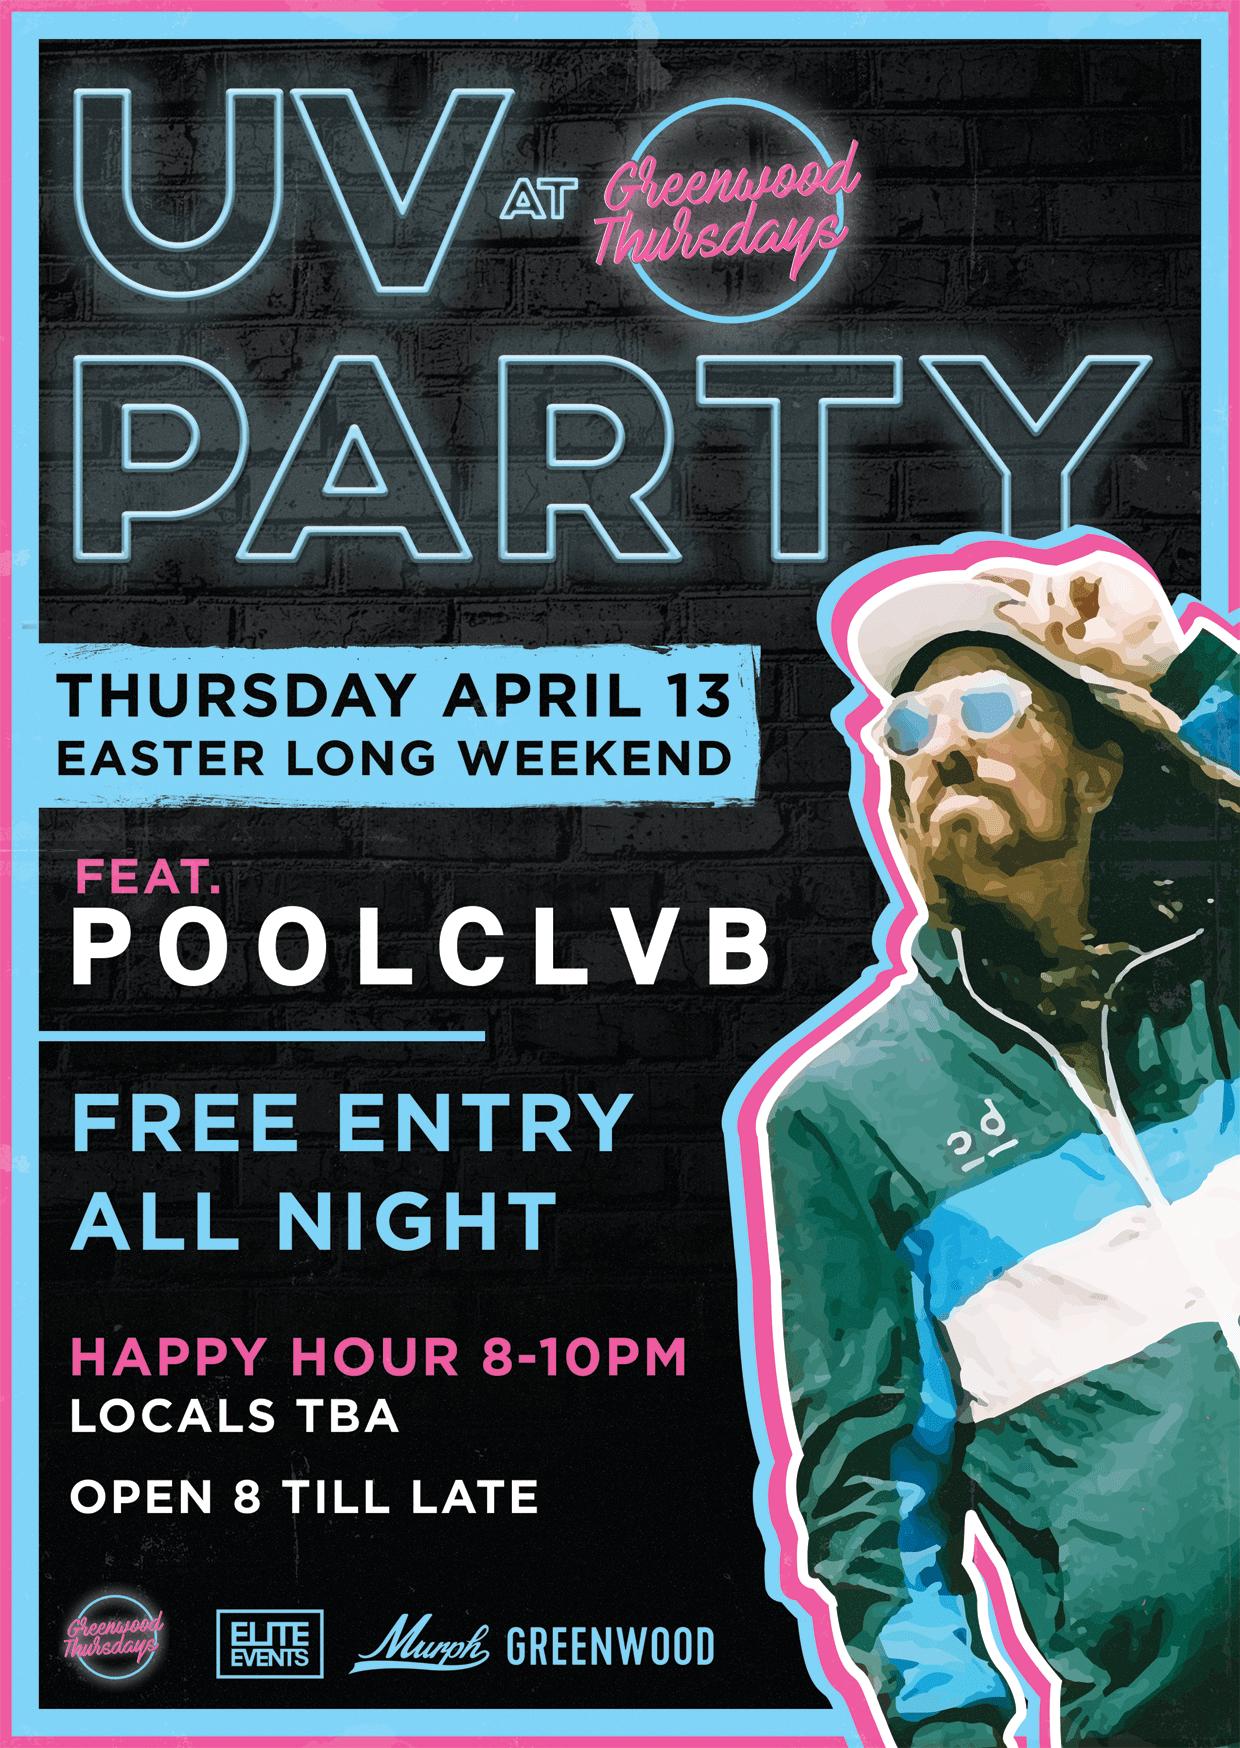 UV Party Poolclvb Greenwood Thursdays North Sydney